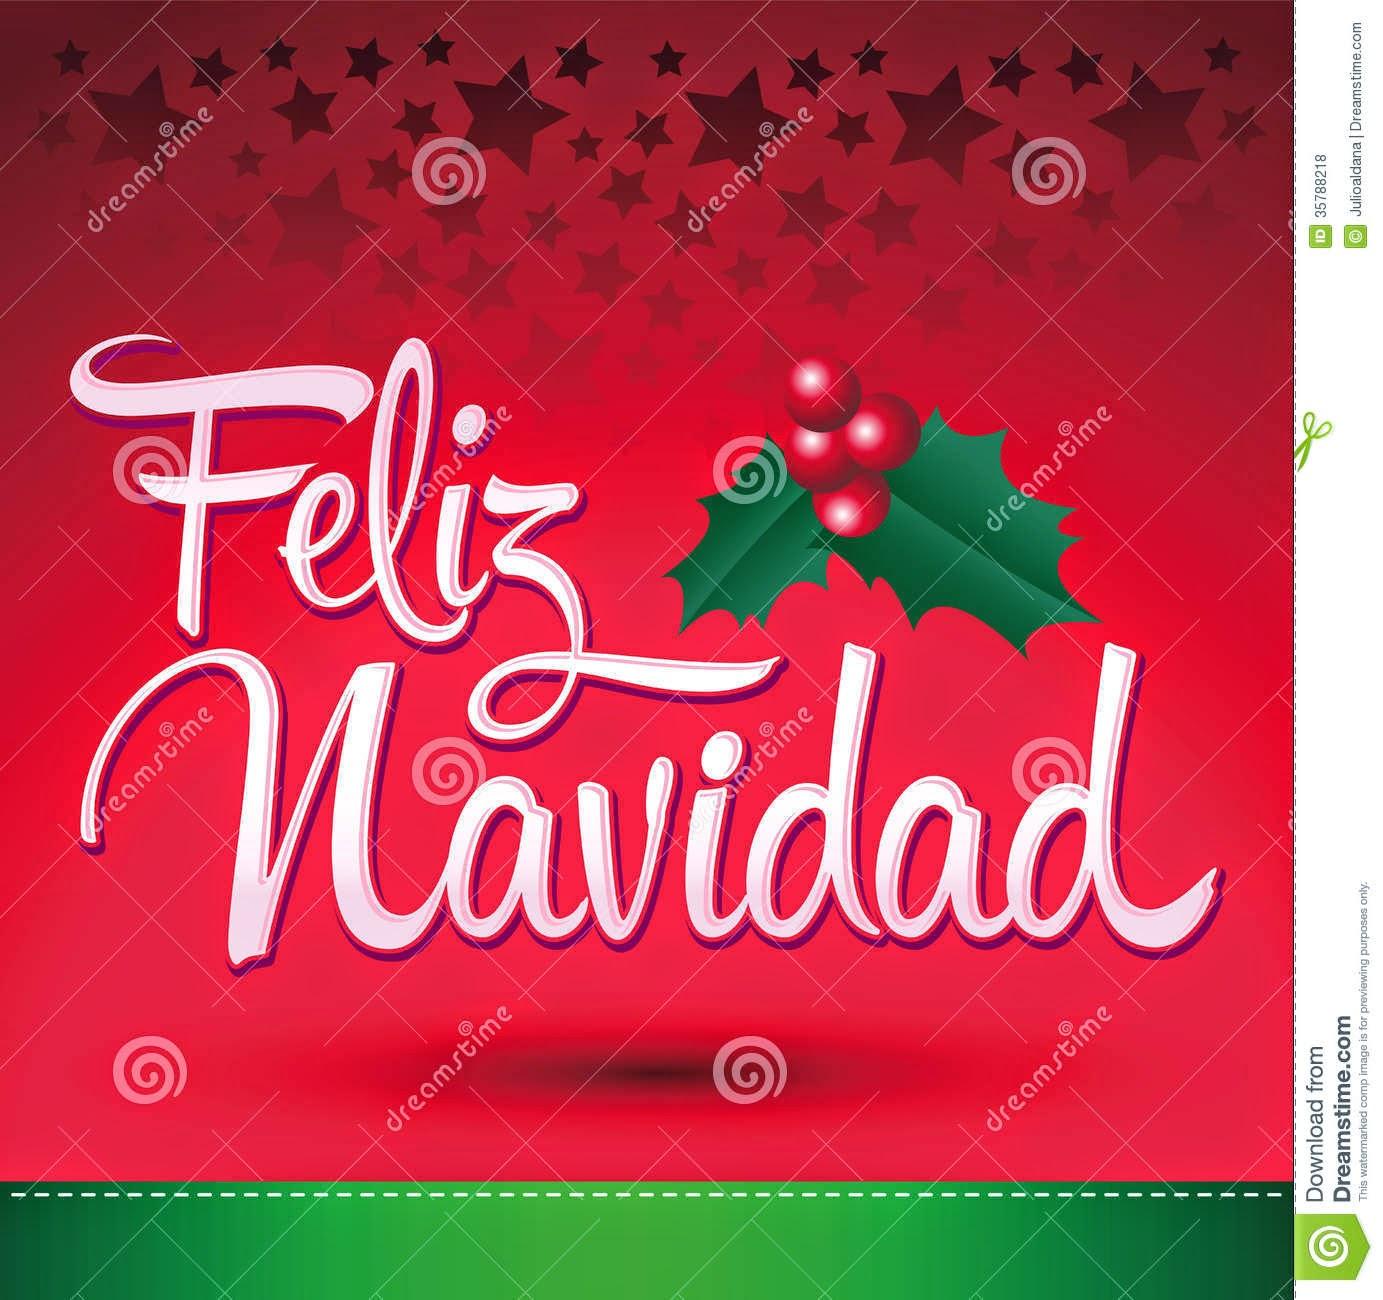 Feliz Navidad Merry Christmas Spanish Text Vector Christmas